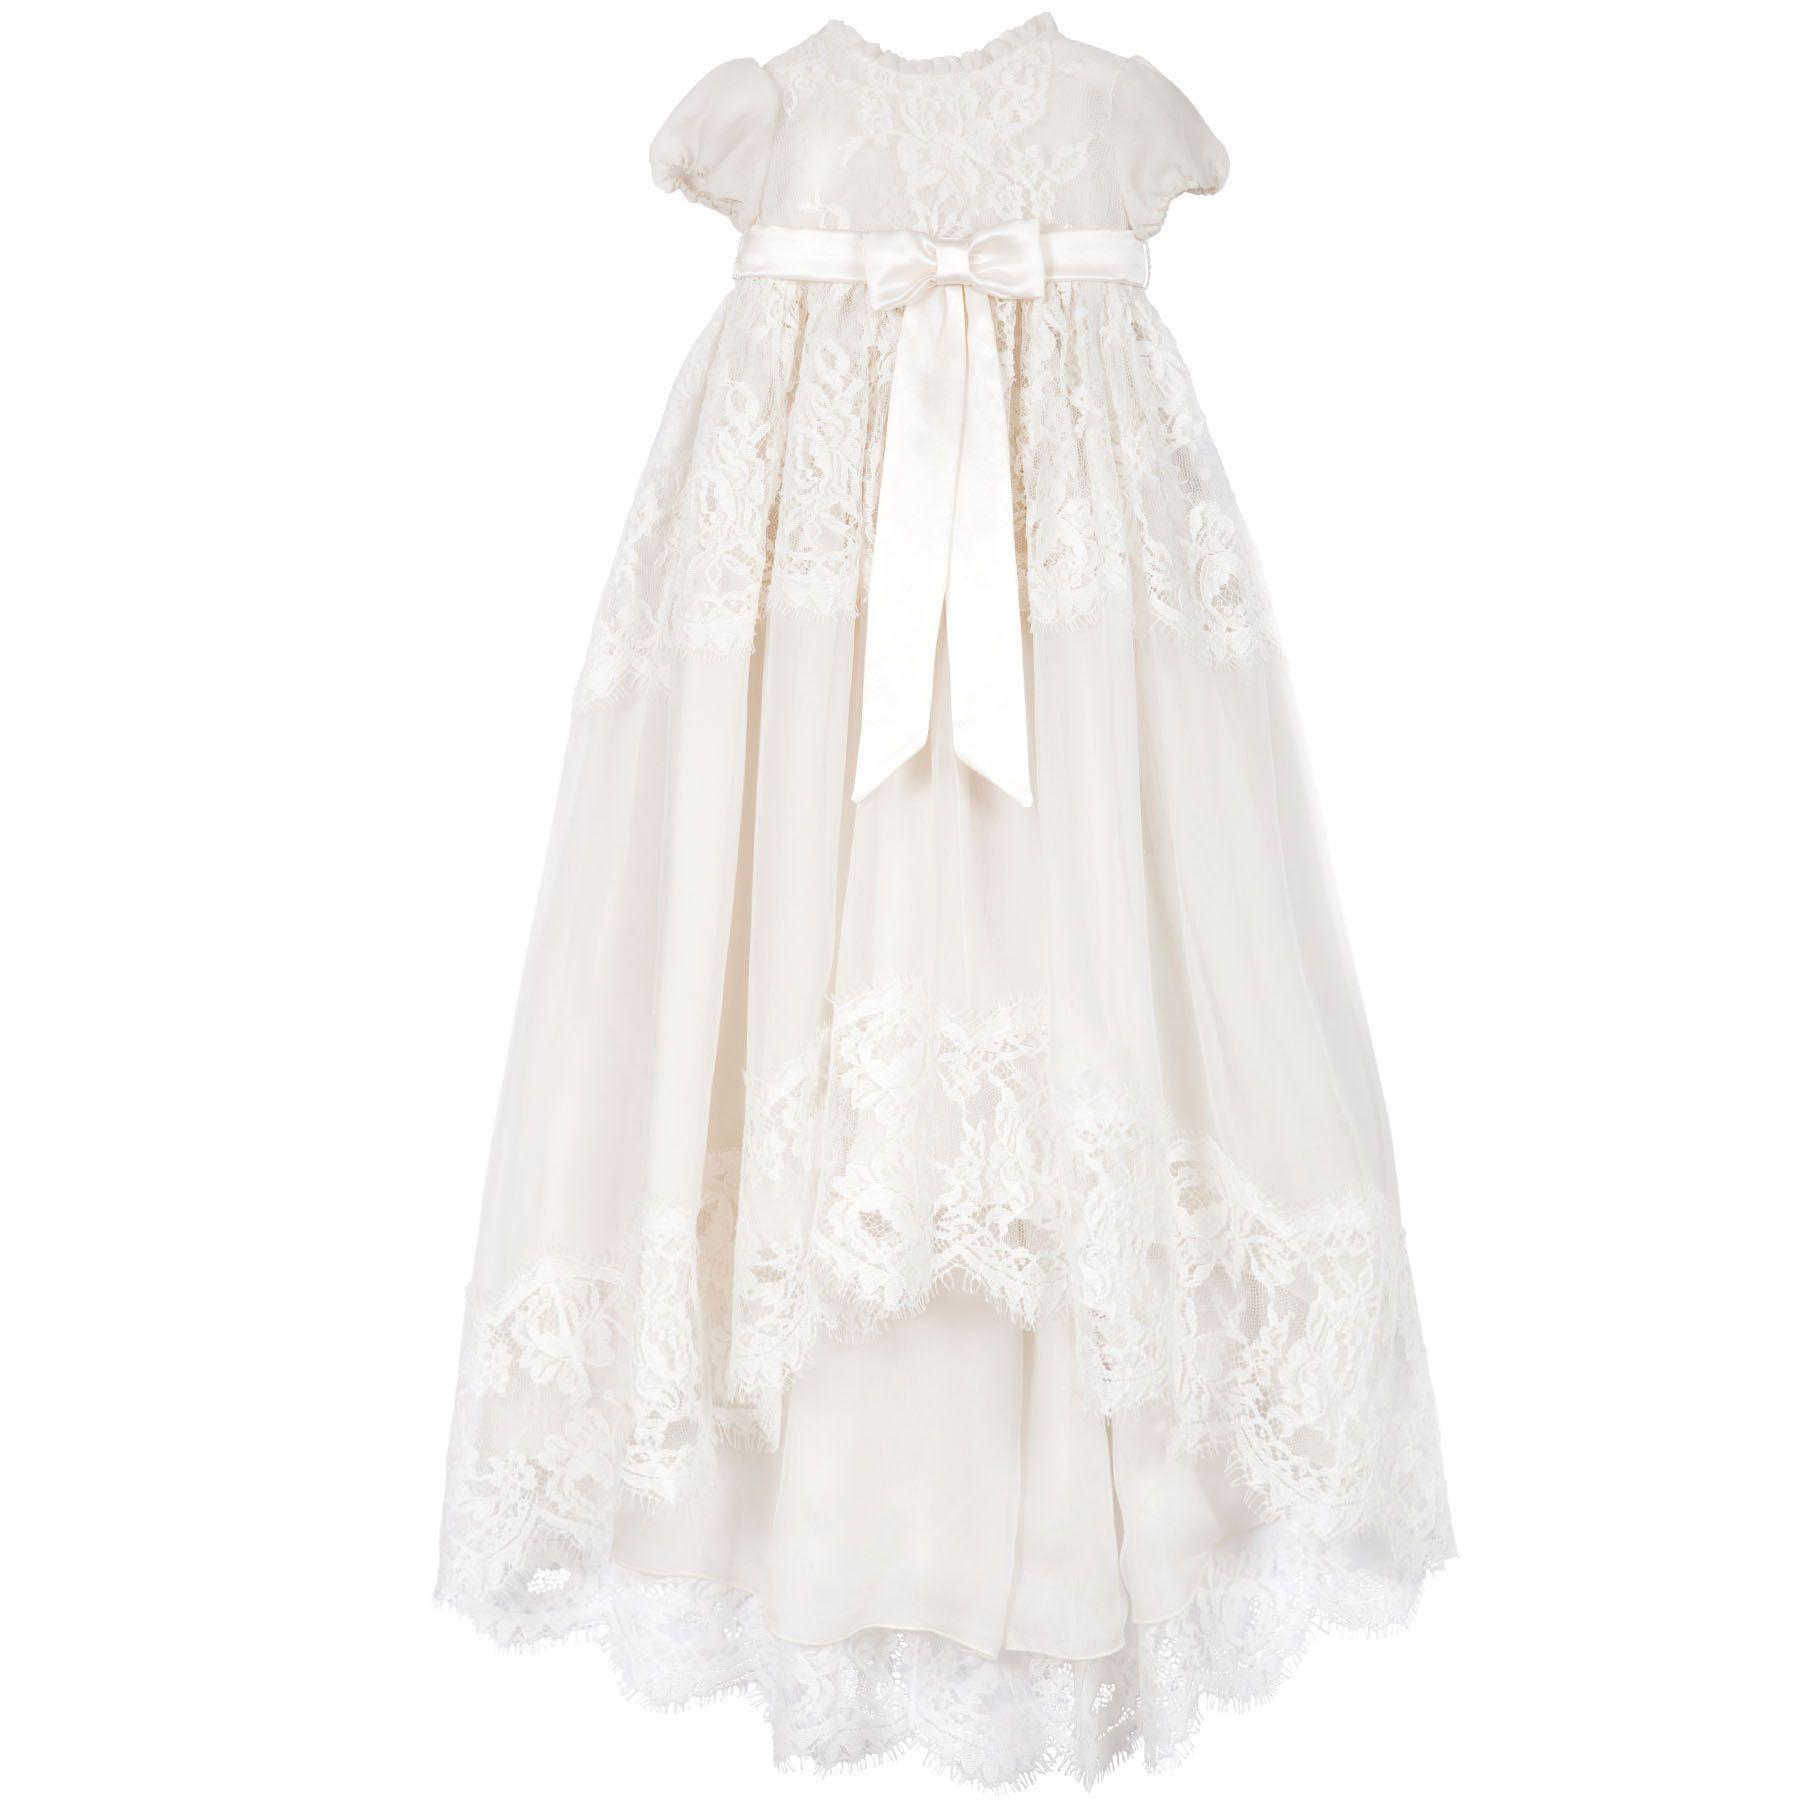 "Dolce &amp;amp; Gabbana Long Christening Dress, $1176; &lt;a target=""_blank"" href=""http://www.melijoe.com/us/dolce-gabbana-long-christening-dress-71293""&gt;melijoe.com&lt;/a&gt;   <!--EndFragment-->"